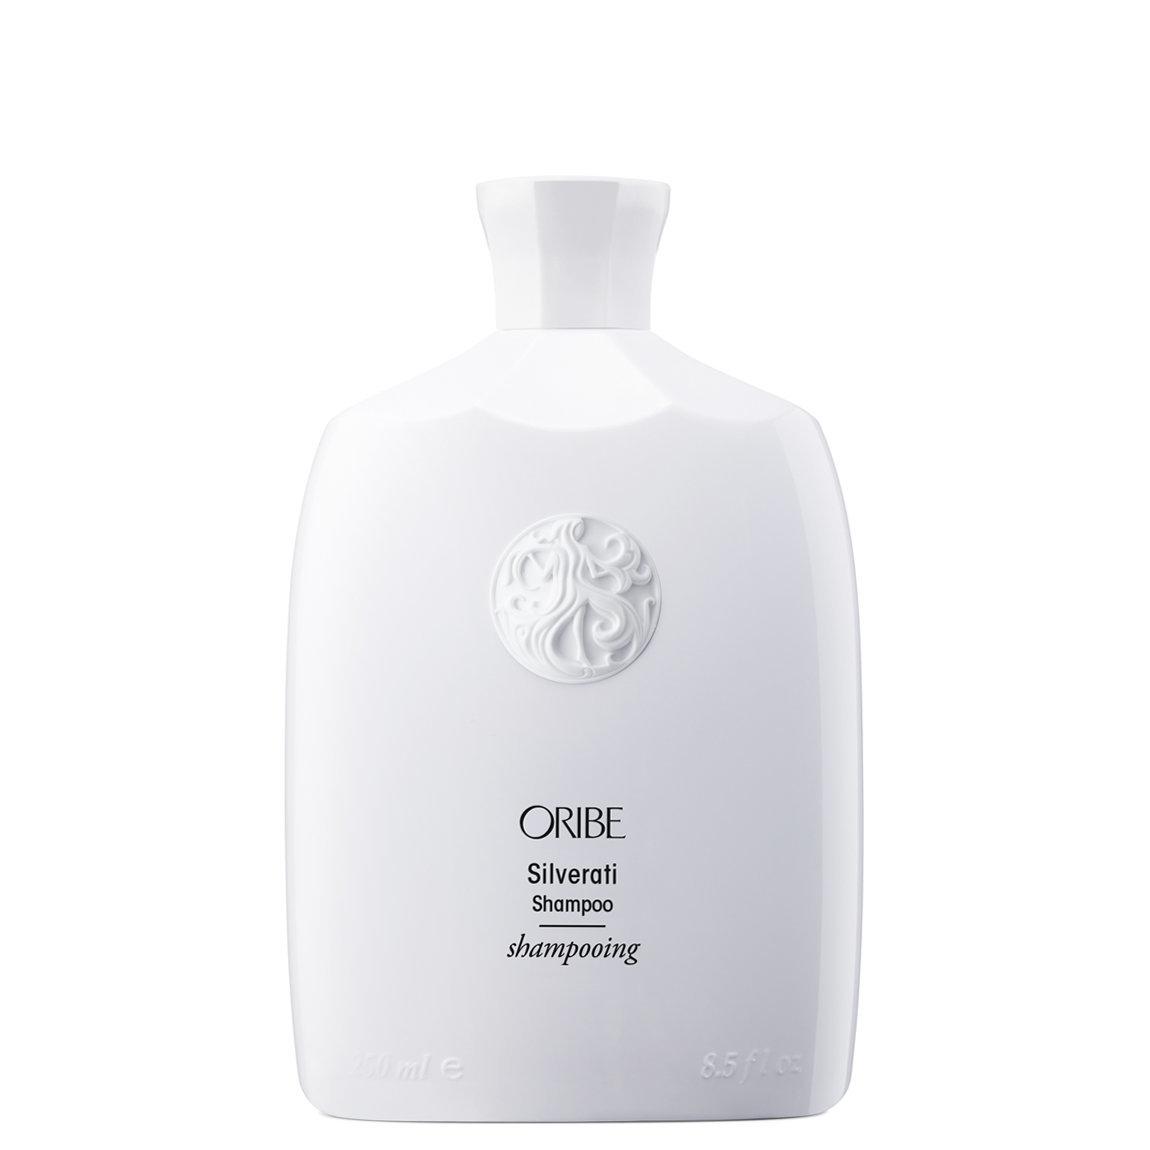 Oribe Silverati Shampoo alternative view 1 - product swatch.